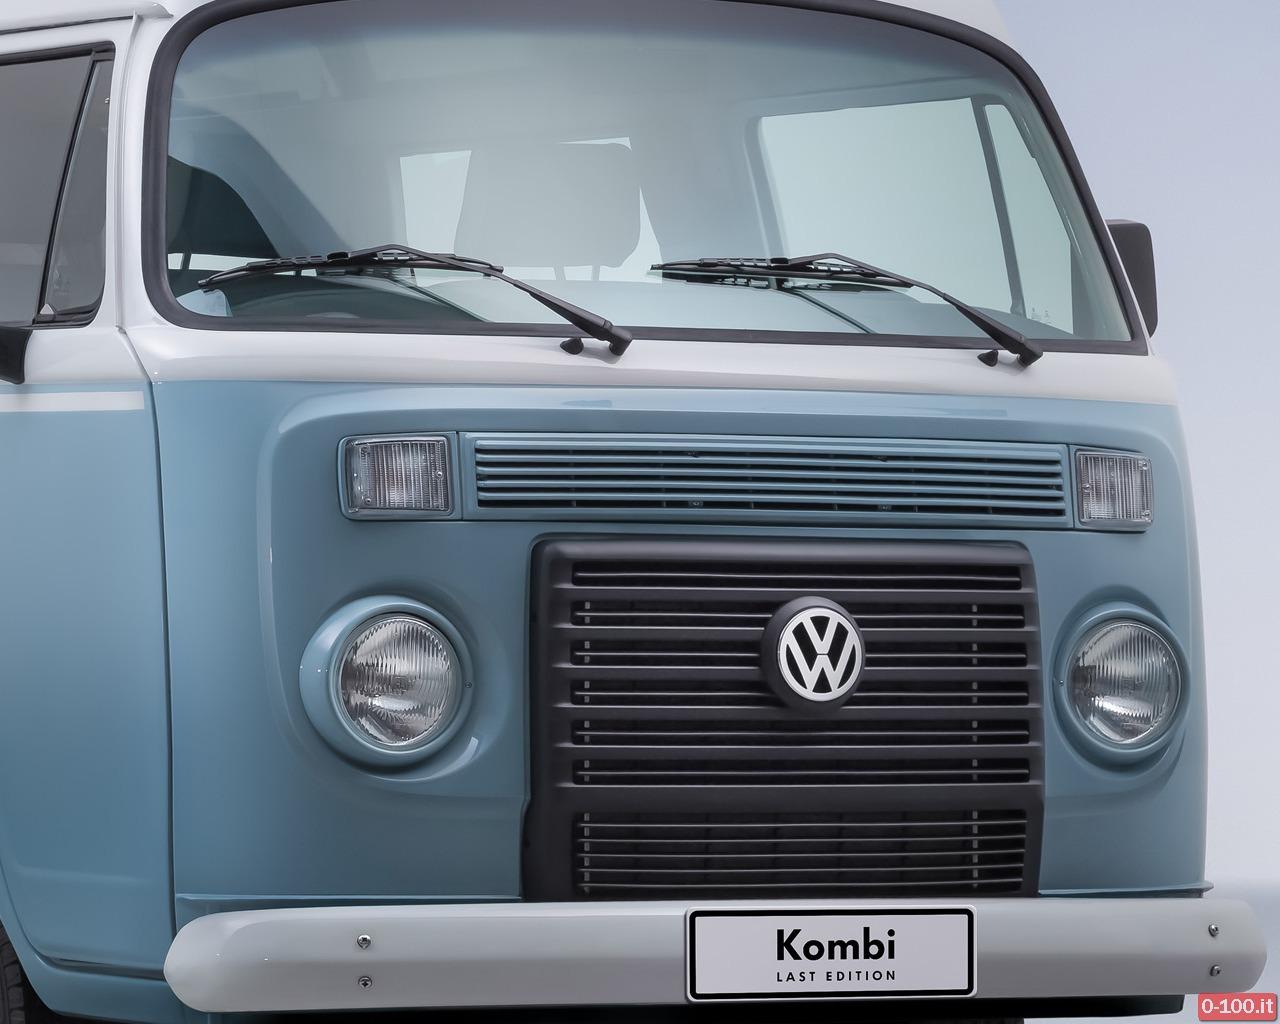 Volkswagen-56-Anos-Kombi-Last-Edition_0-100_26